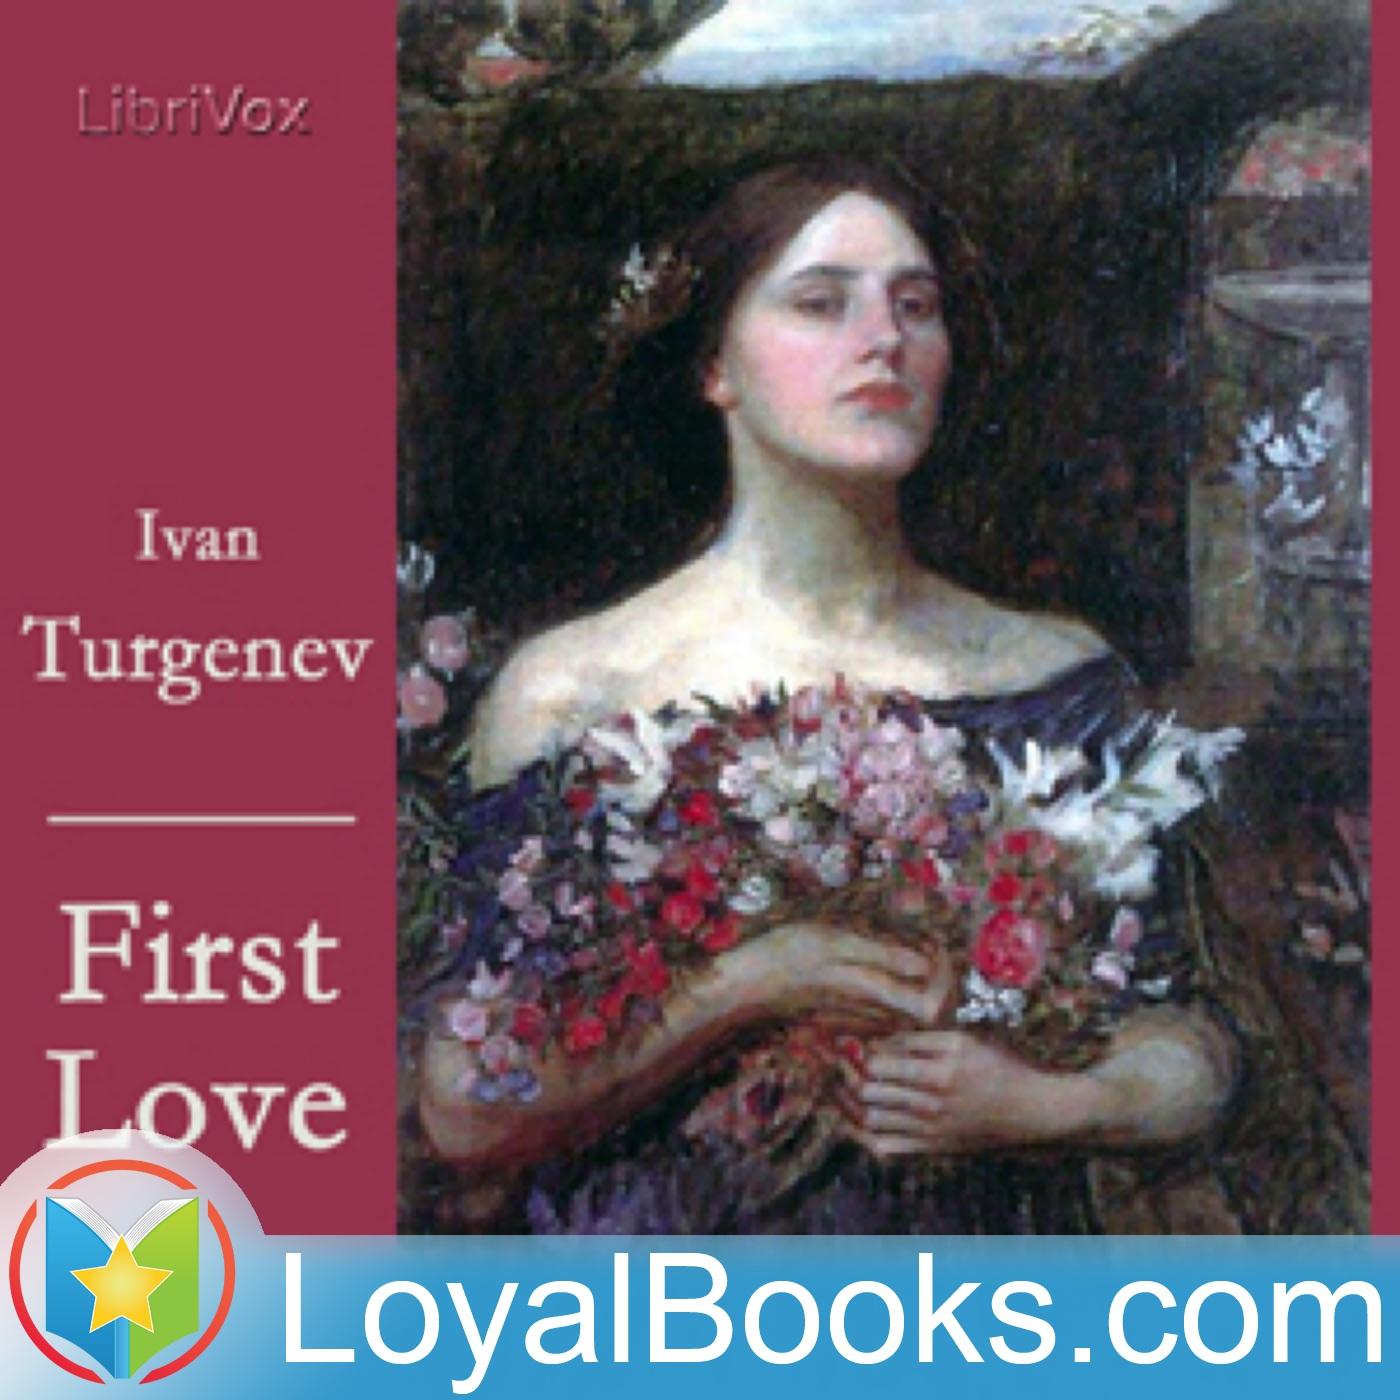 <![CDATA[First Love by Ivan S. Turgenev]]>